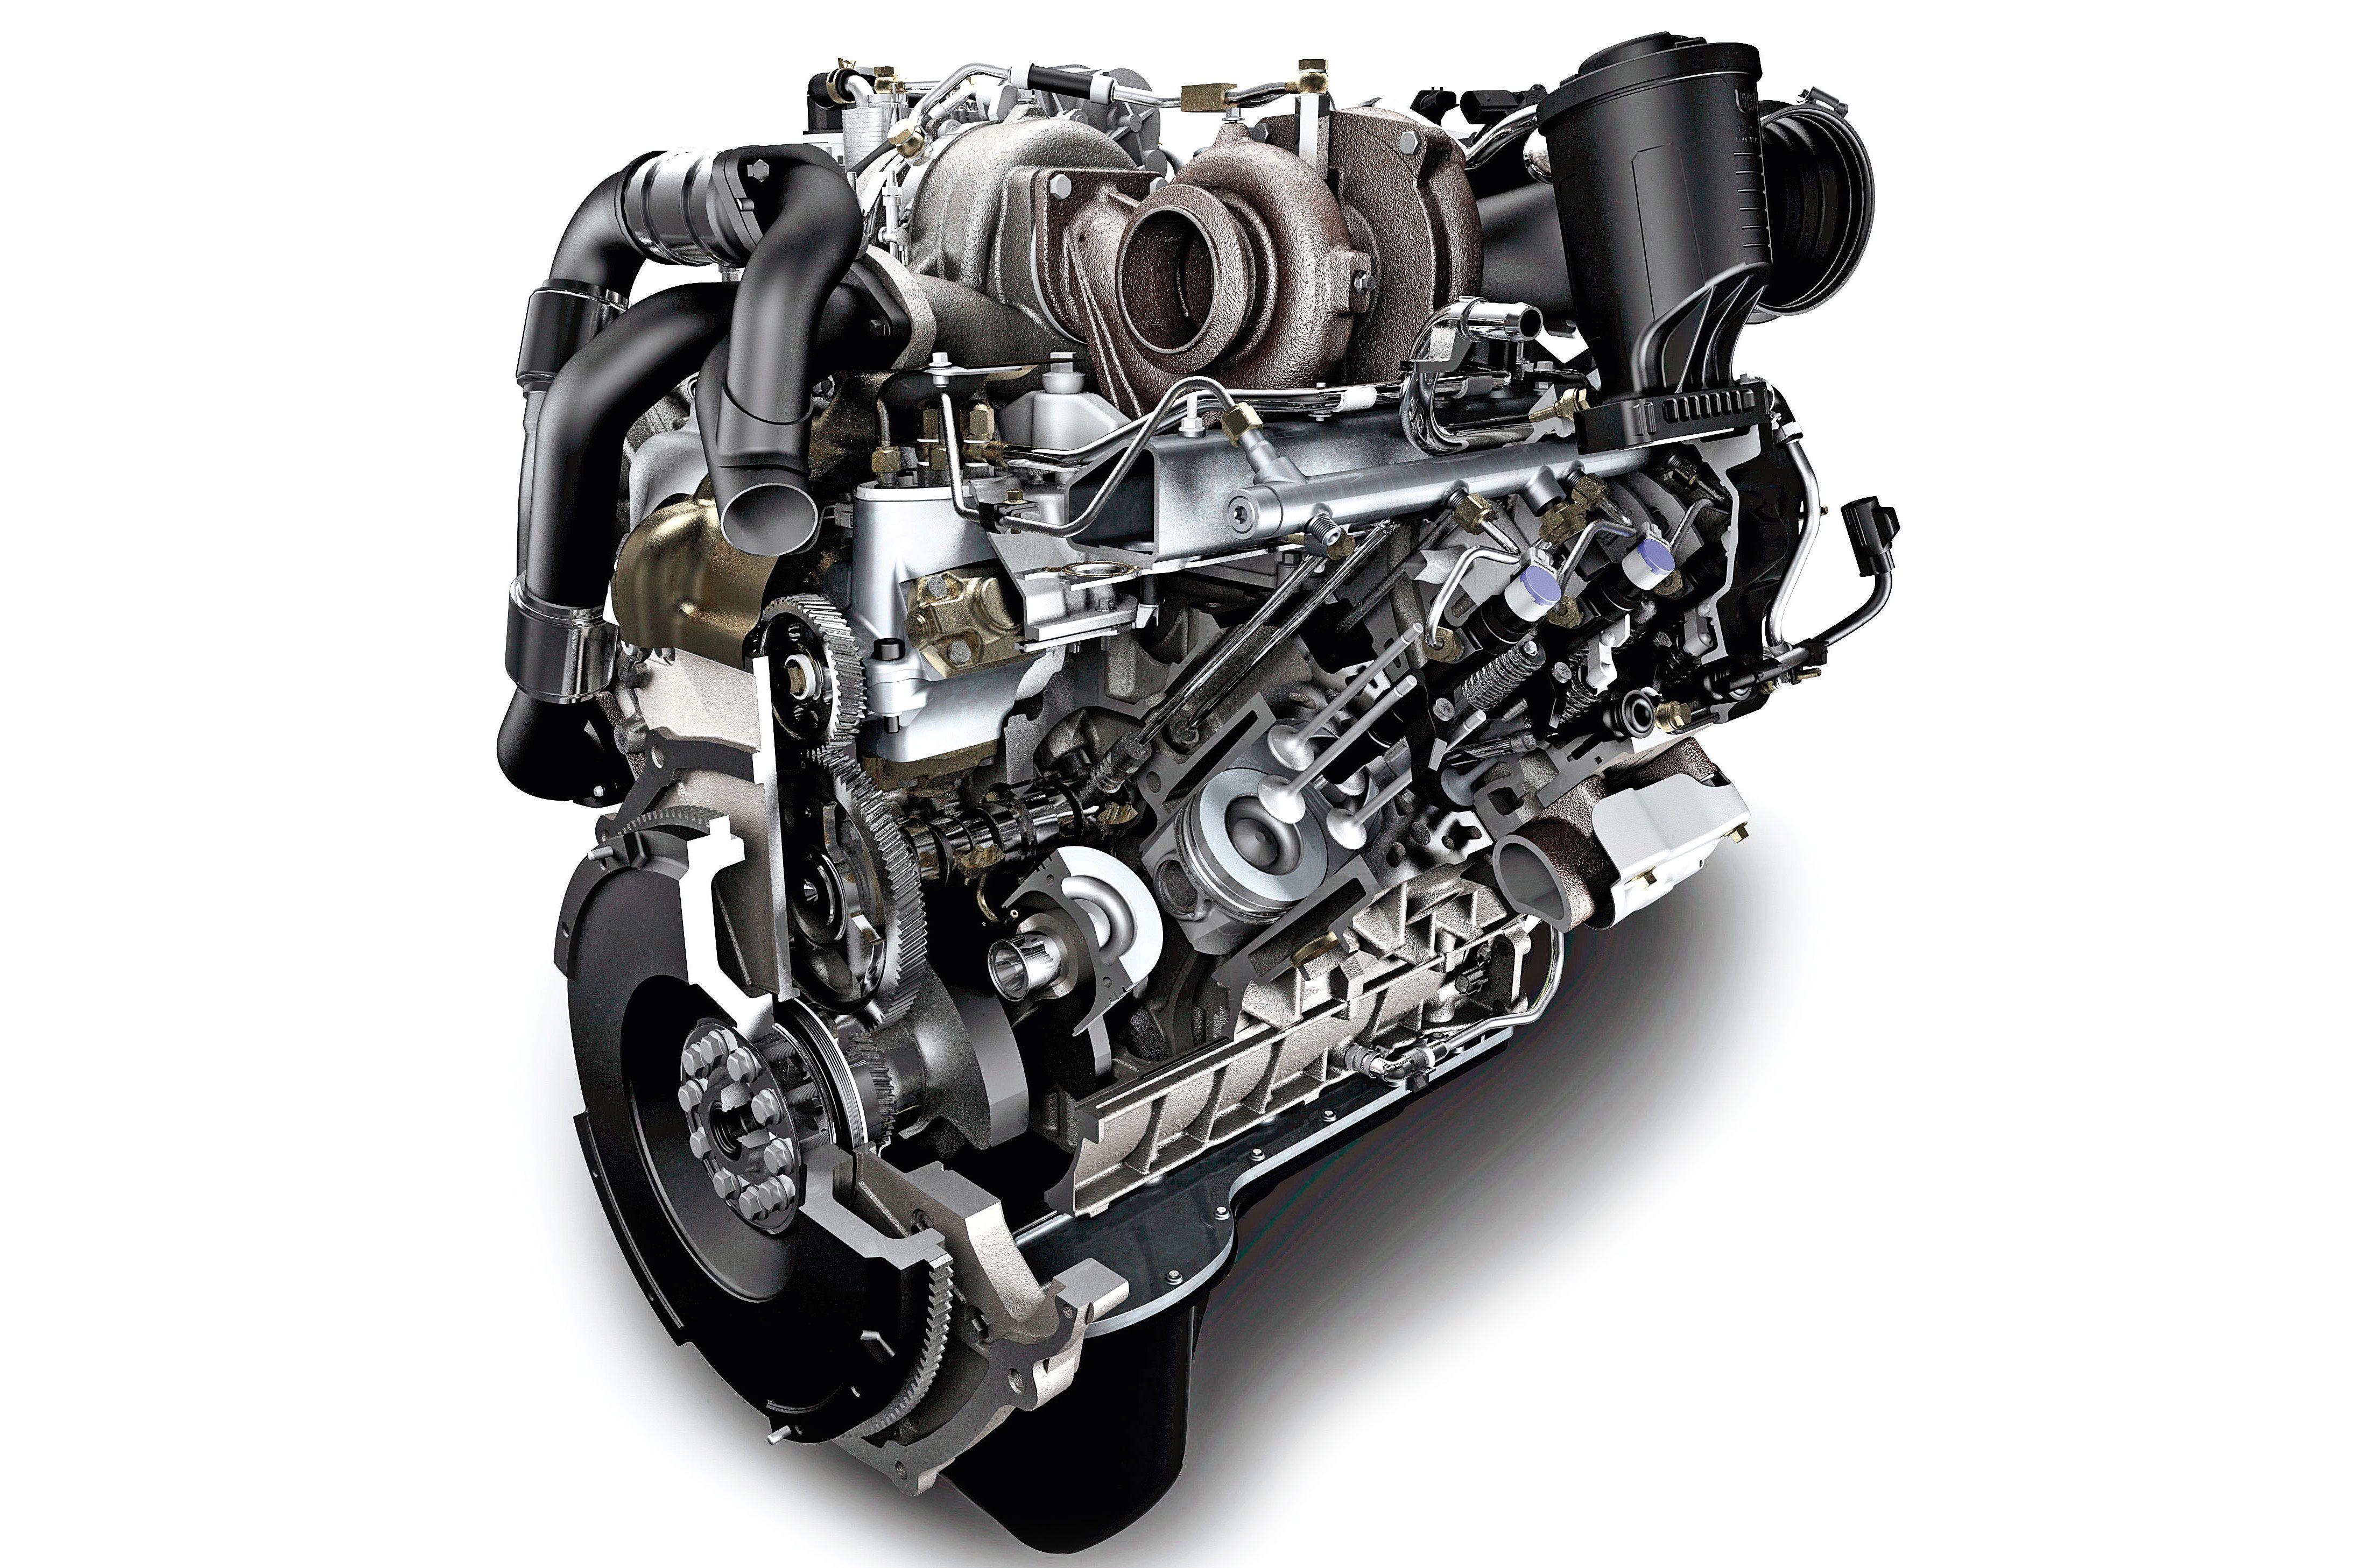 6.4l power stroke engine